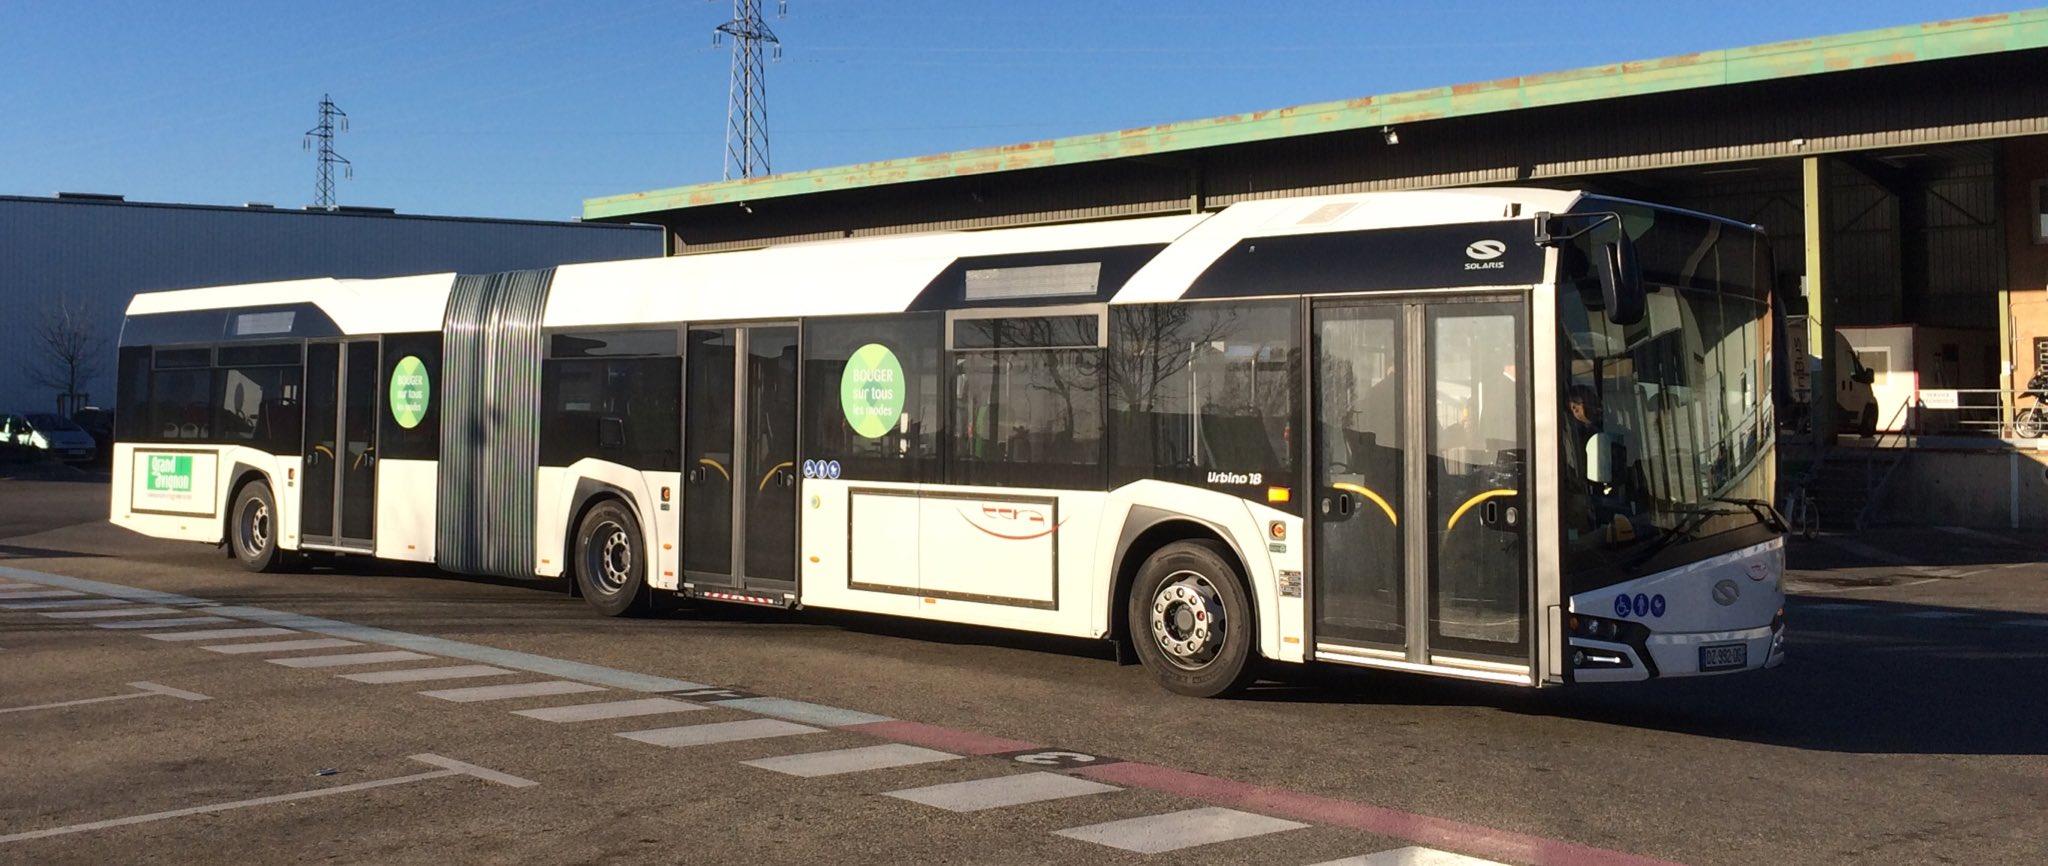 Transport mobilit urbaine afficher le - Ligne bus avignon ...